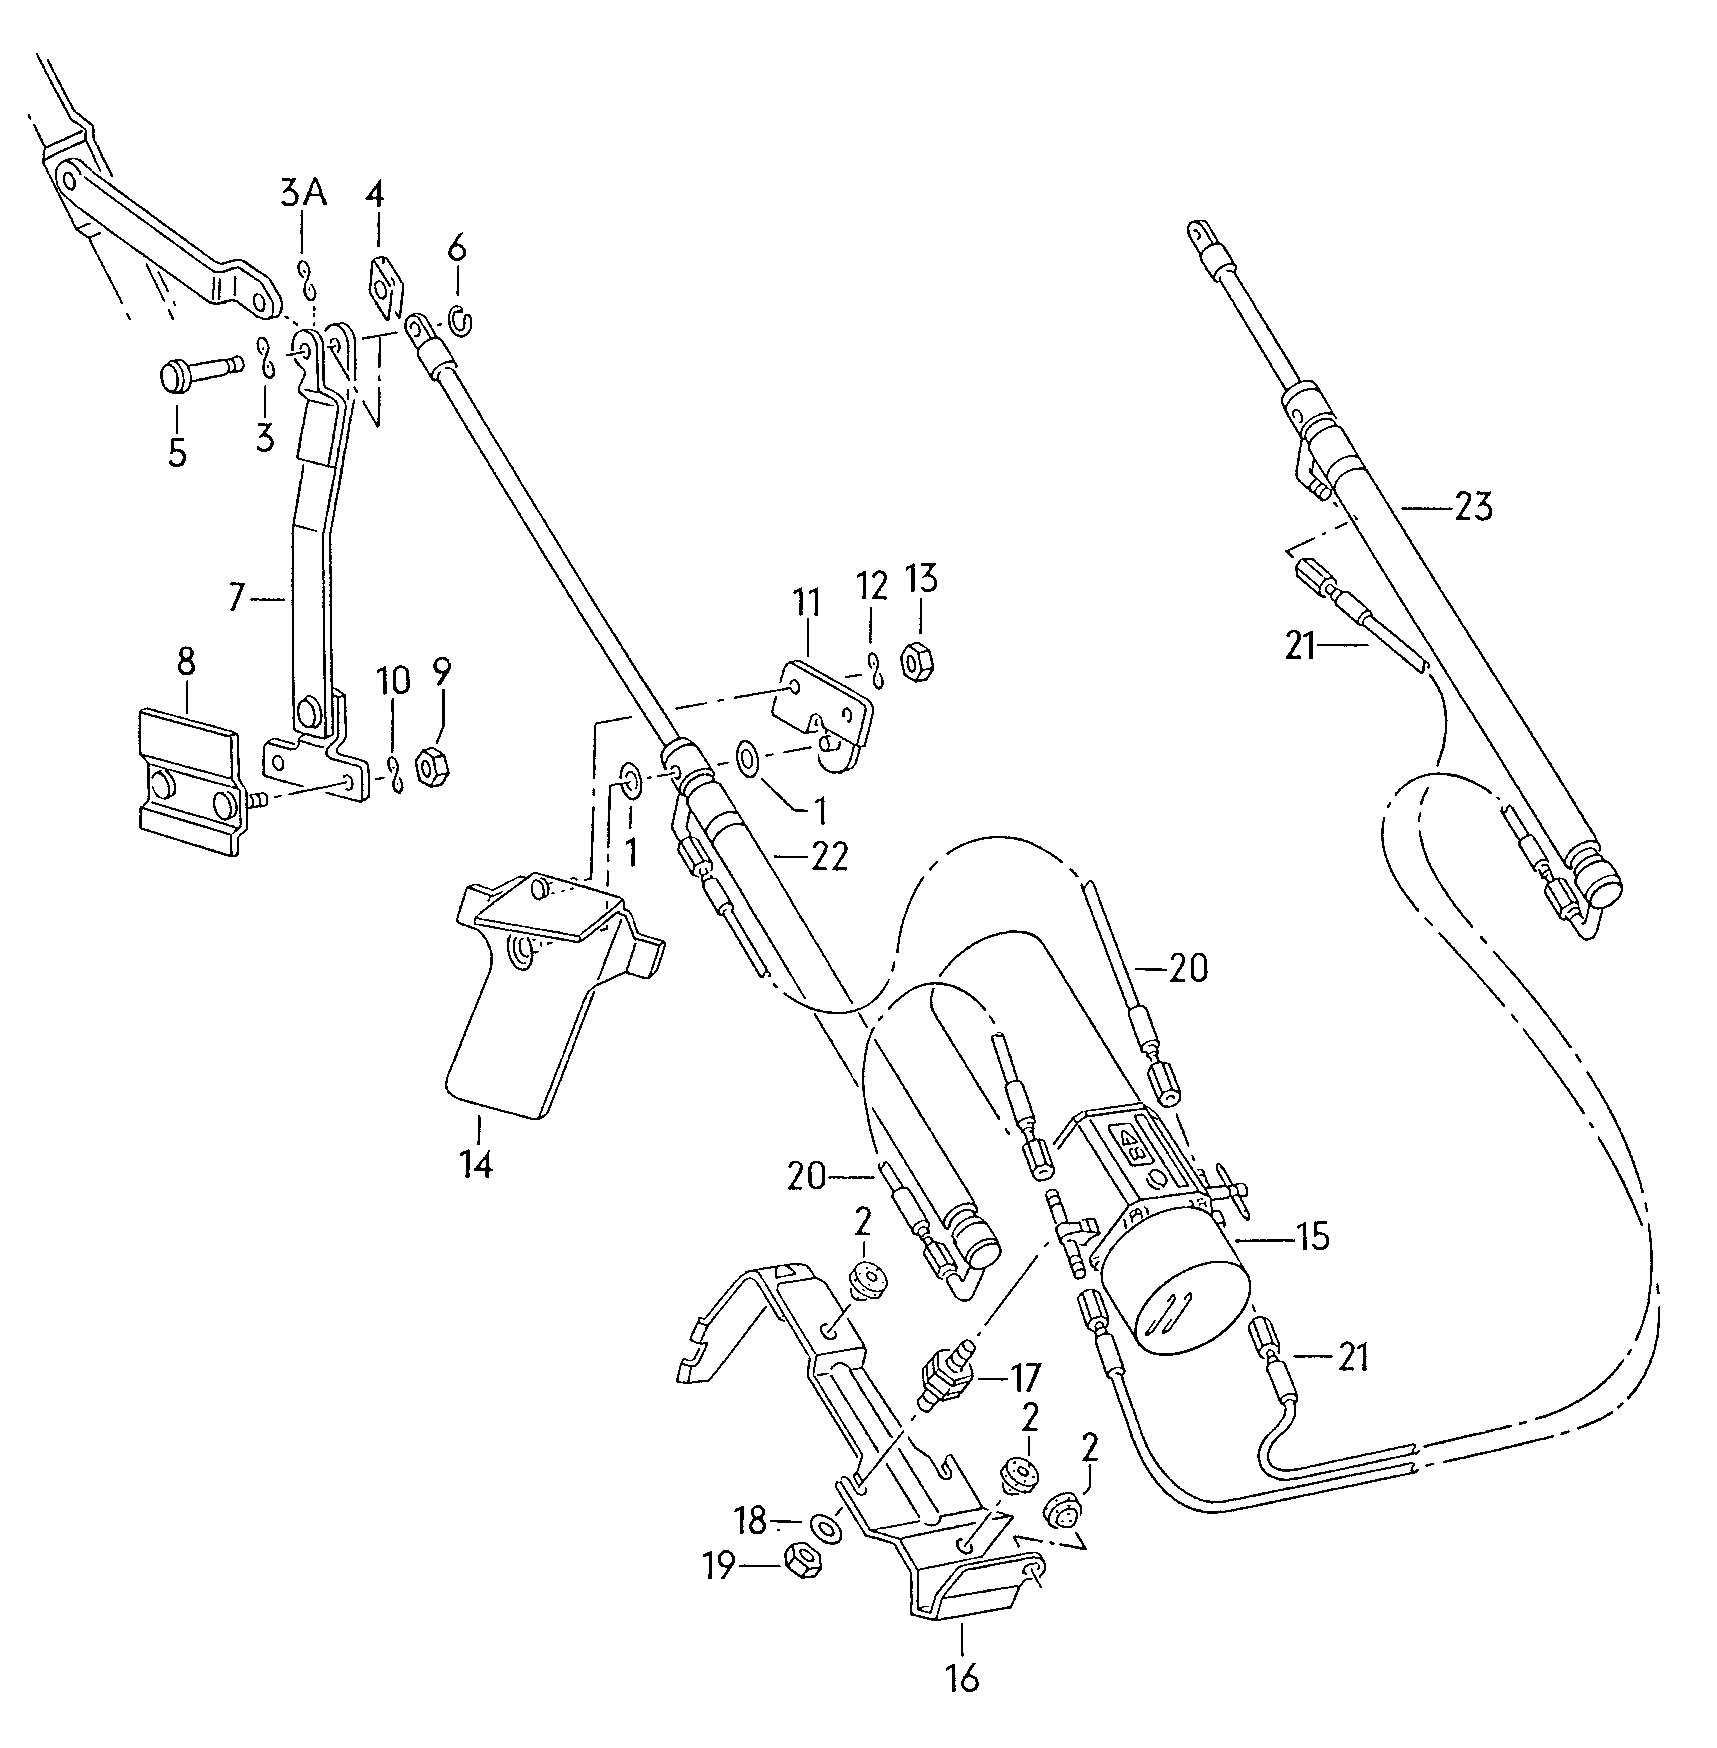 Vw Cabriolet Parts Diagrams Best Secret Wiring Diagram 2002 Volkswagen Cabrio Engine Imageresizertool Com 1999 List